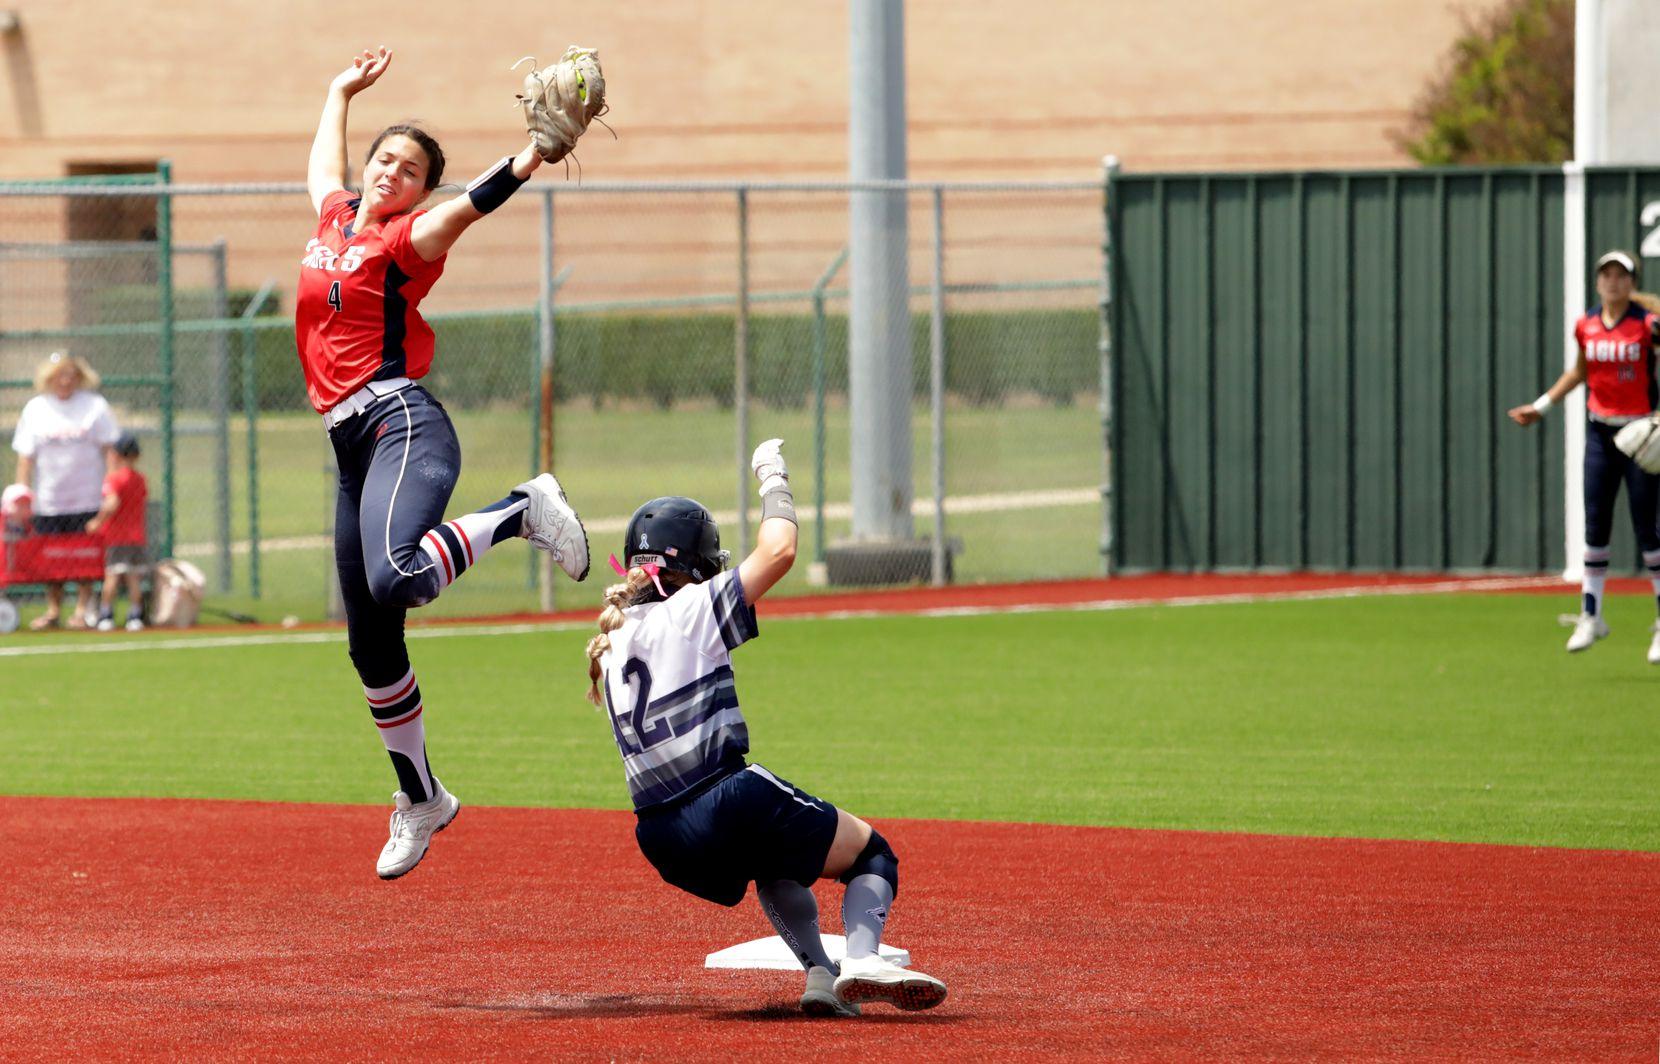 Allen High School player #4, Sami Hood, attempts to stop Flower Mound High School player #12, Jenna Becker, during a softball game at Allen High School in Allen, TX, on May 15, 2021. (Jason Janik/Special Contributor)